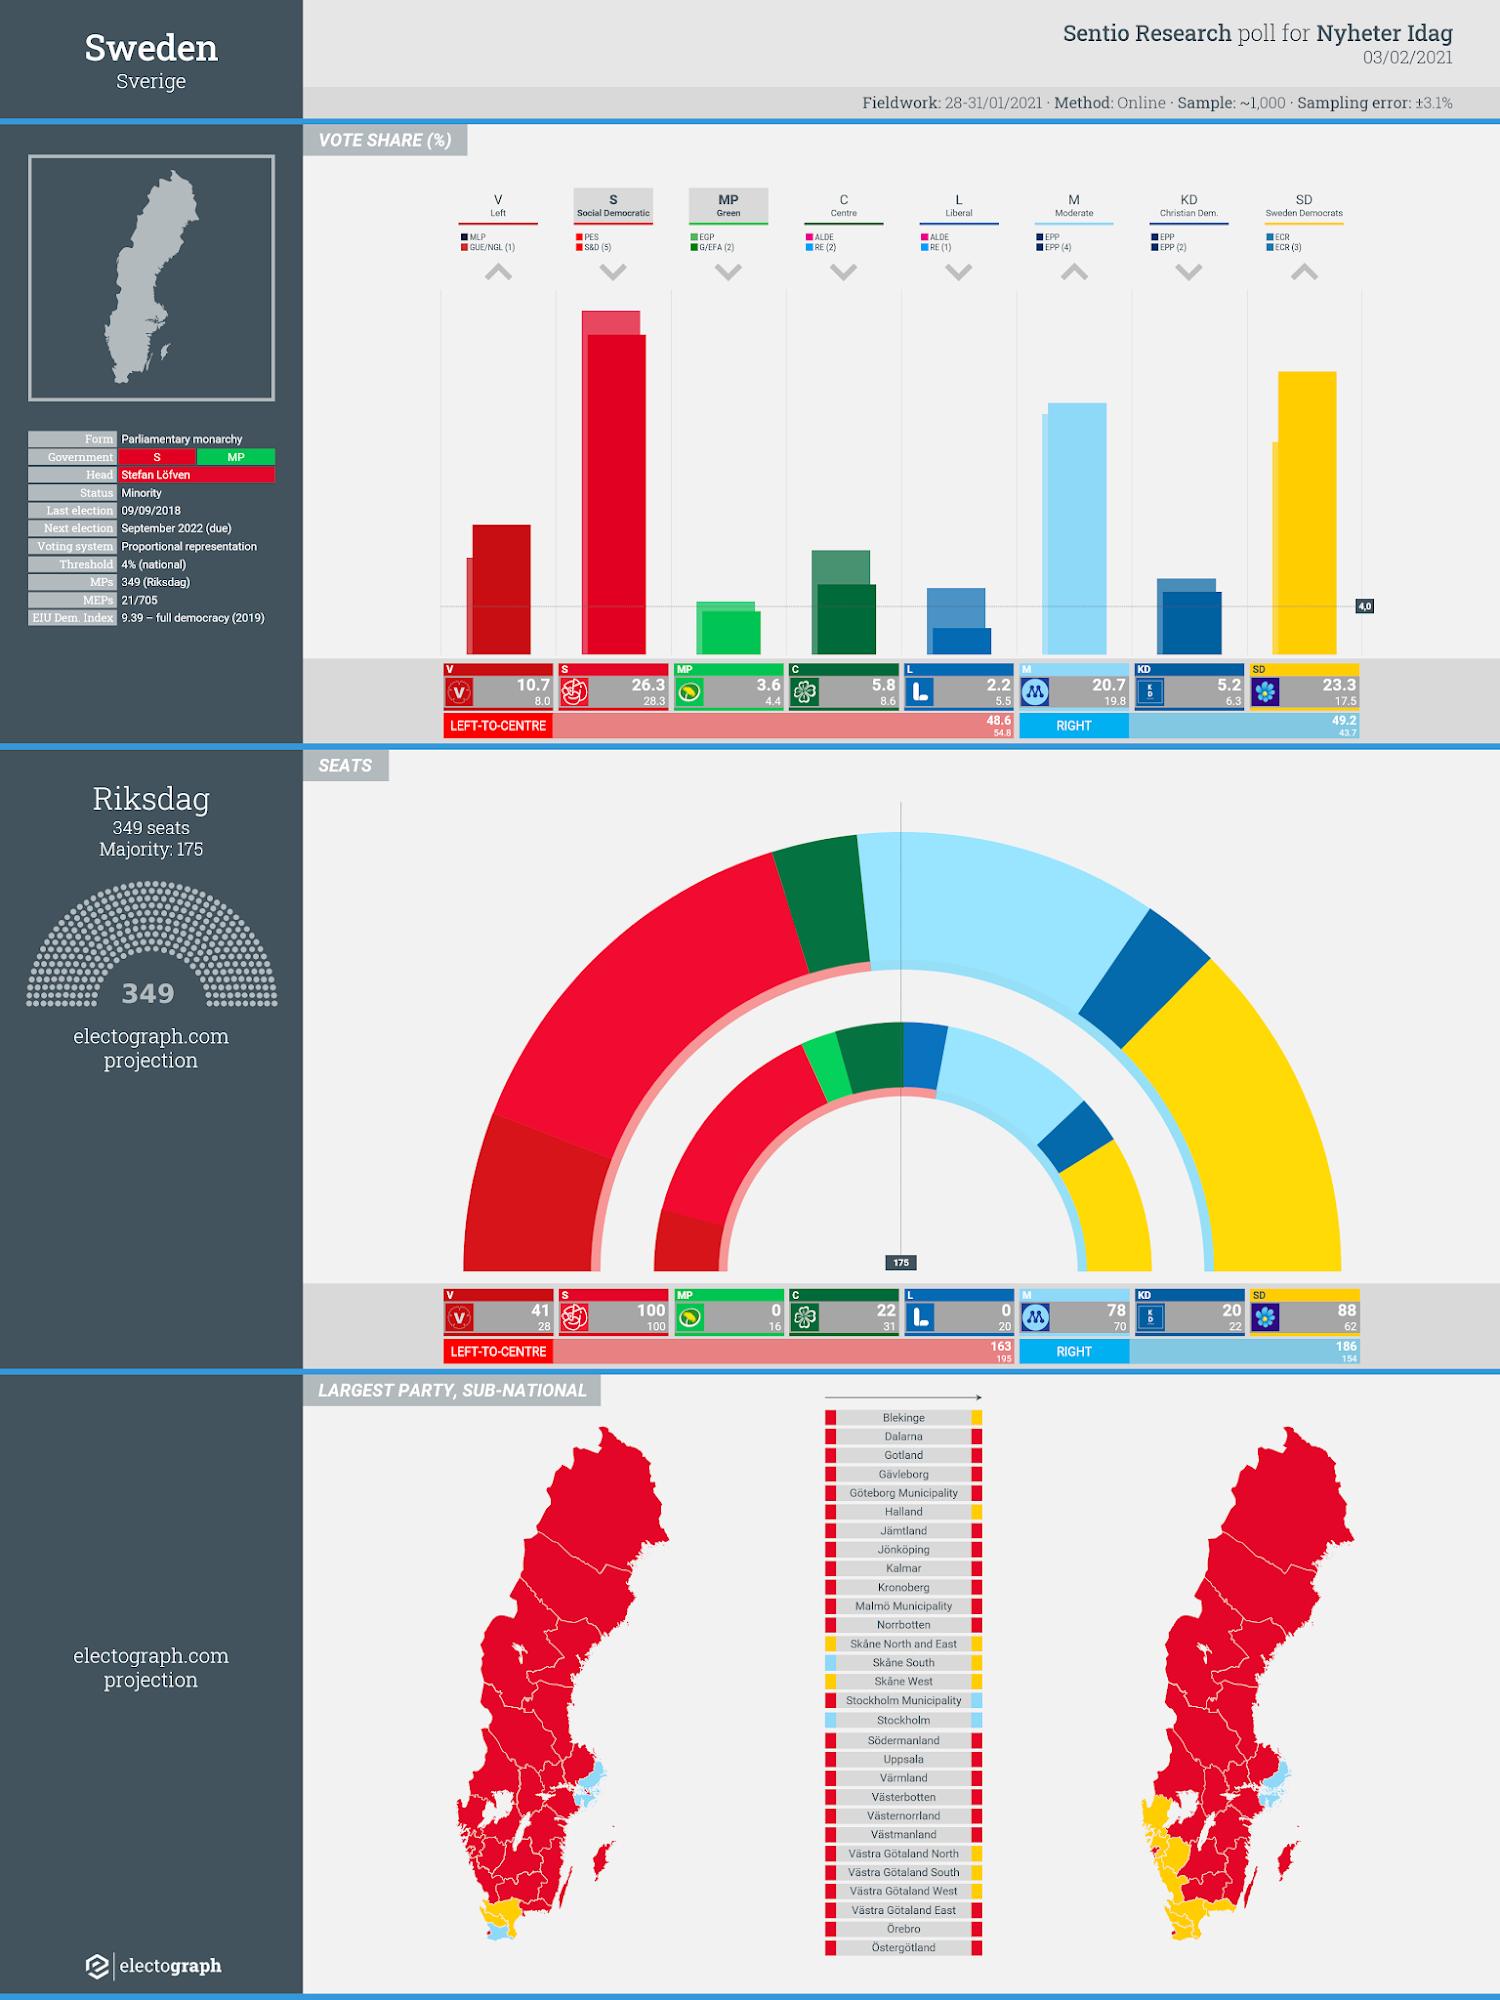 SWEDEN: Sentio Research poll chart for Nyheter Idag, 3 February 2021